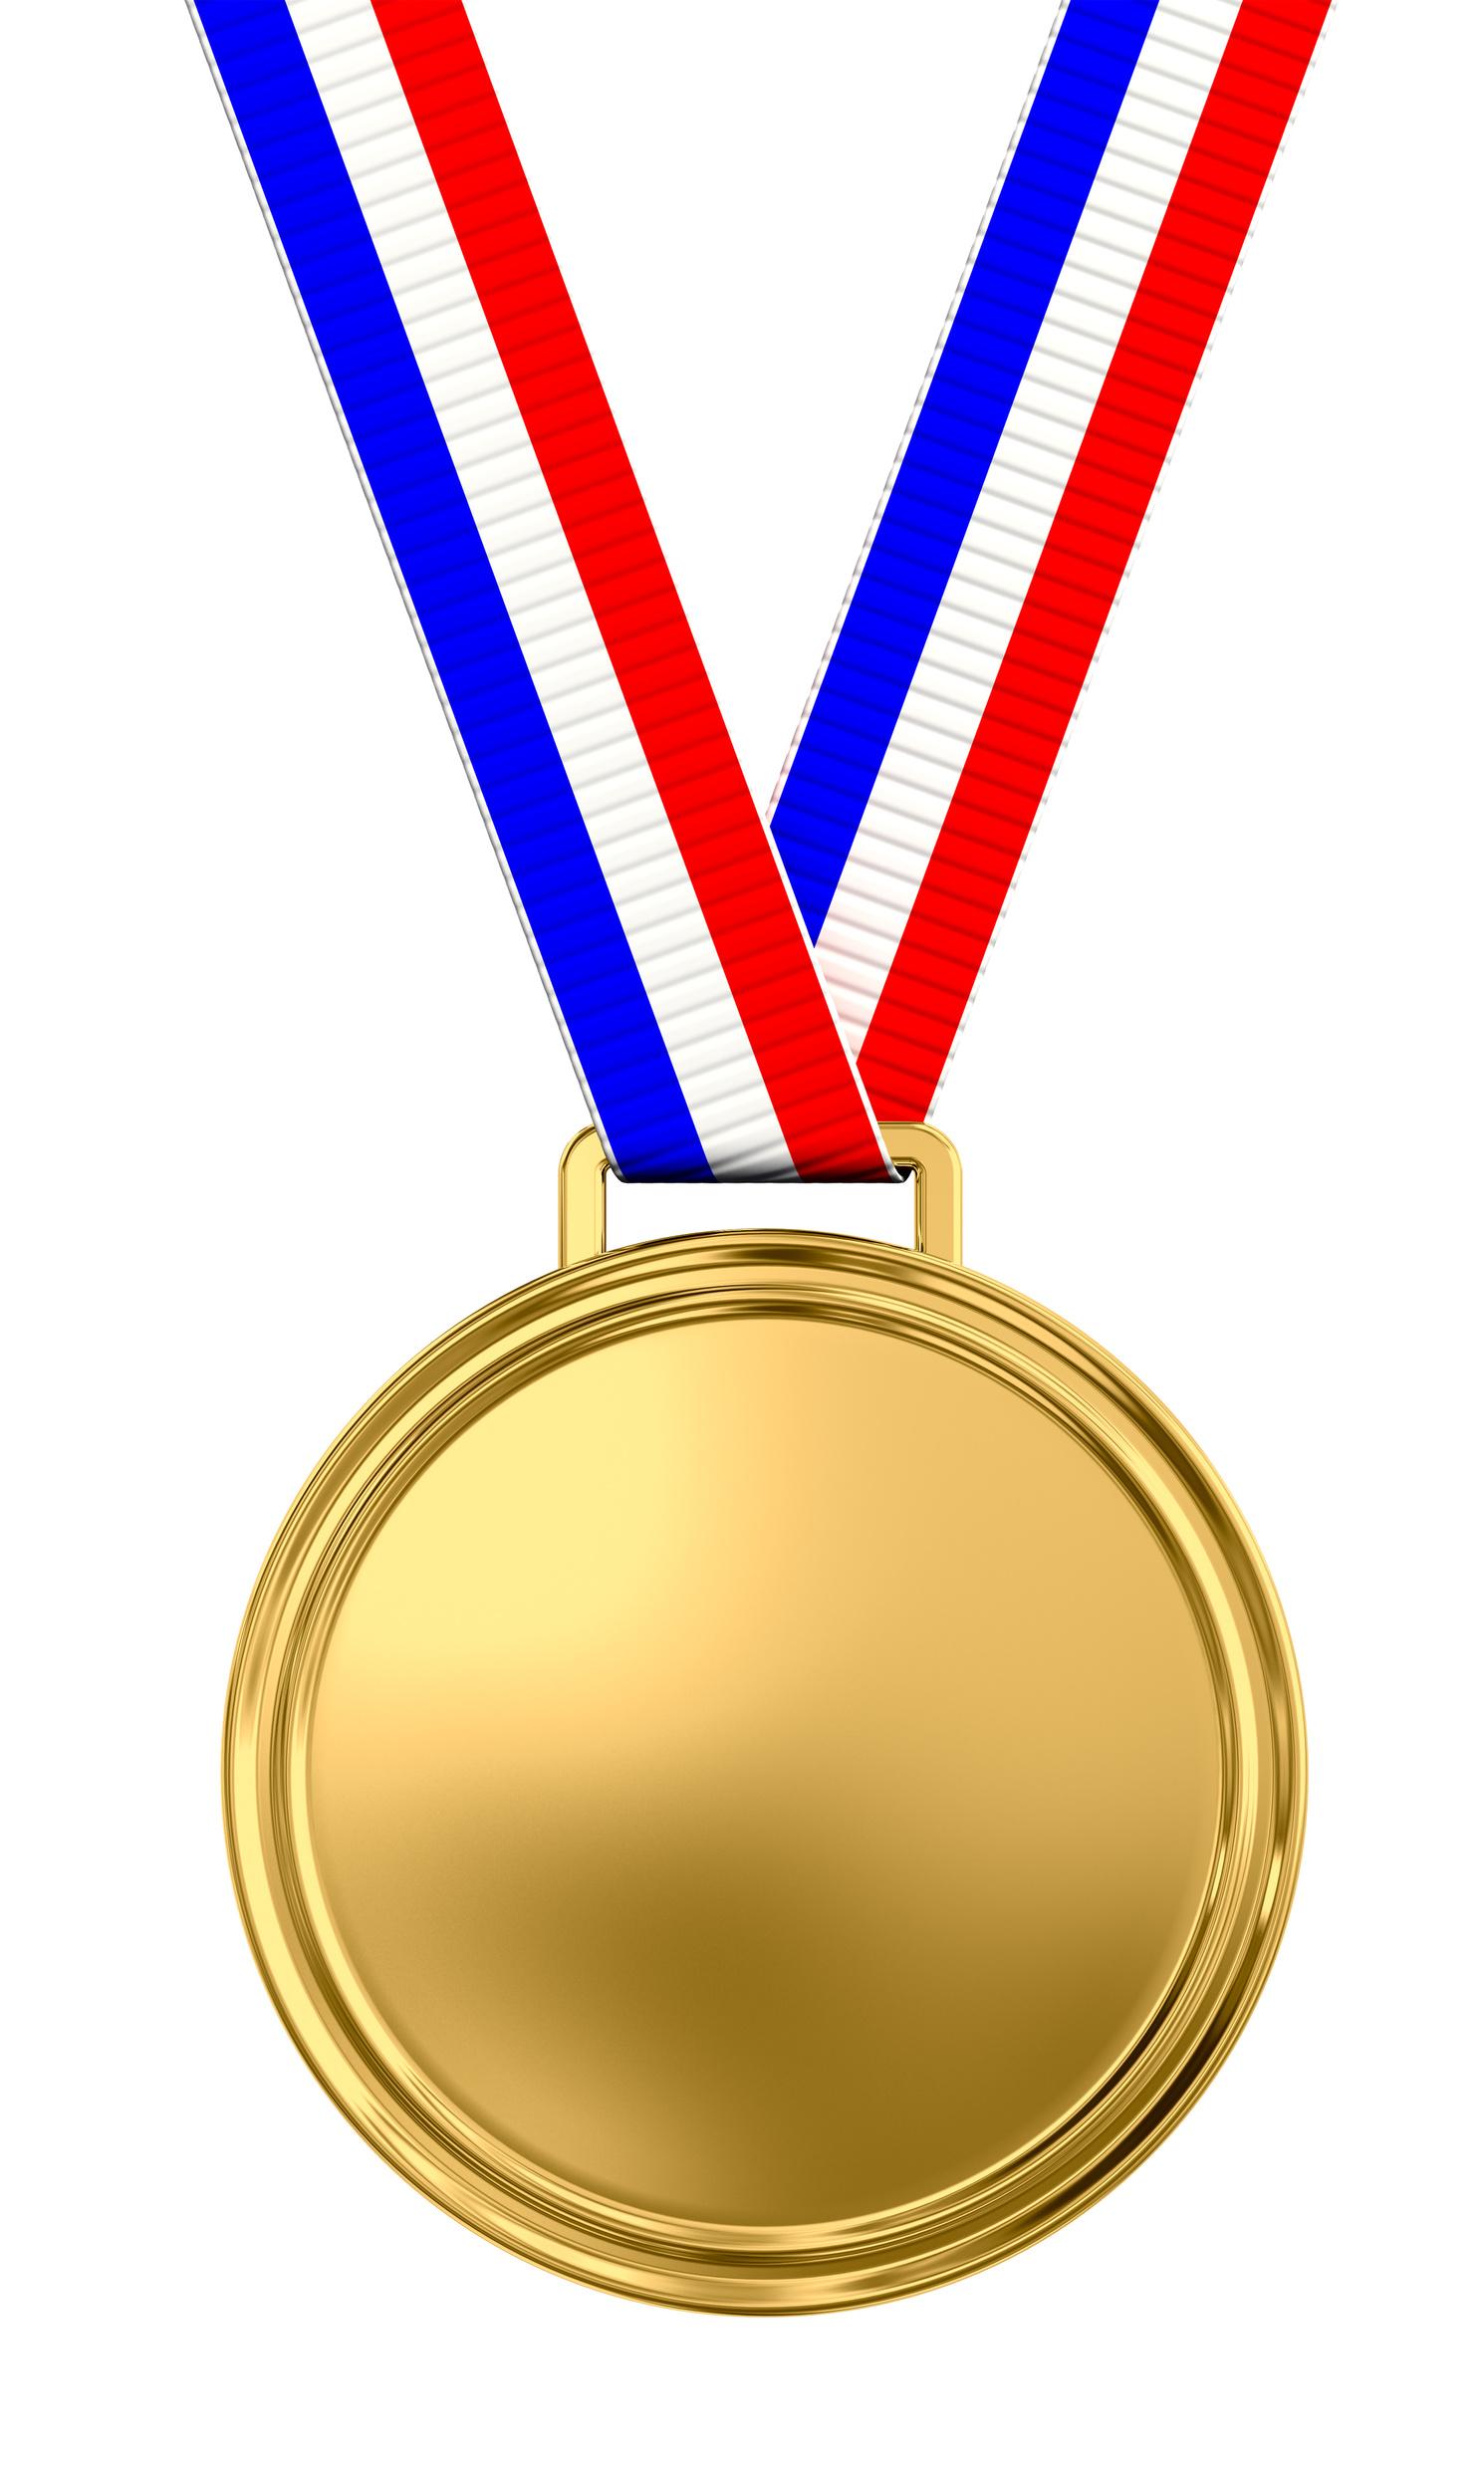 medal clipart